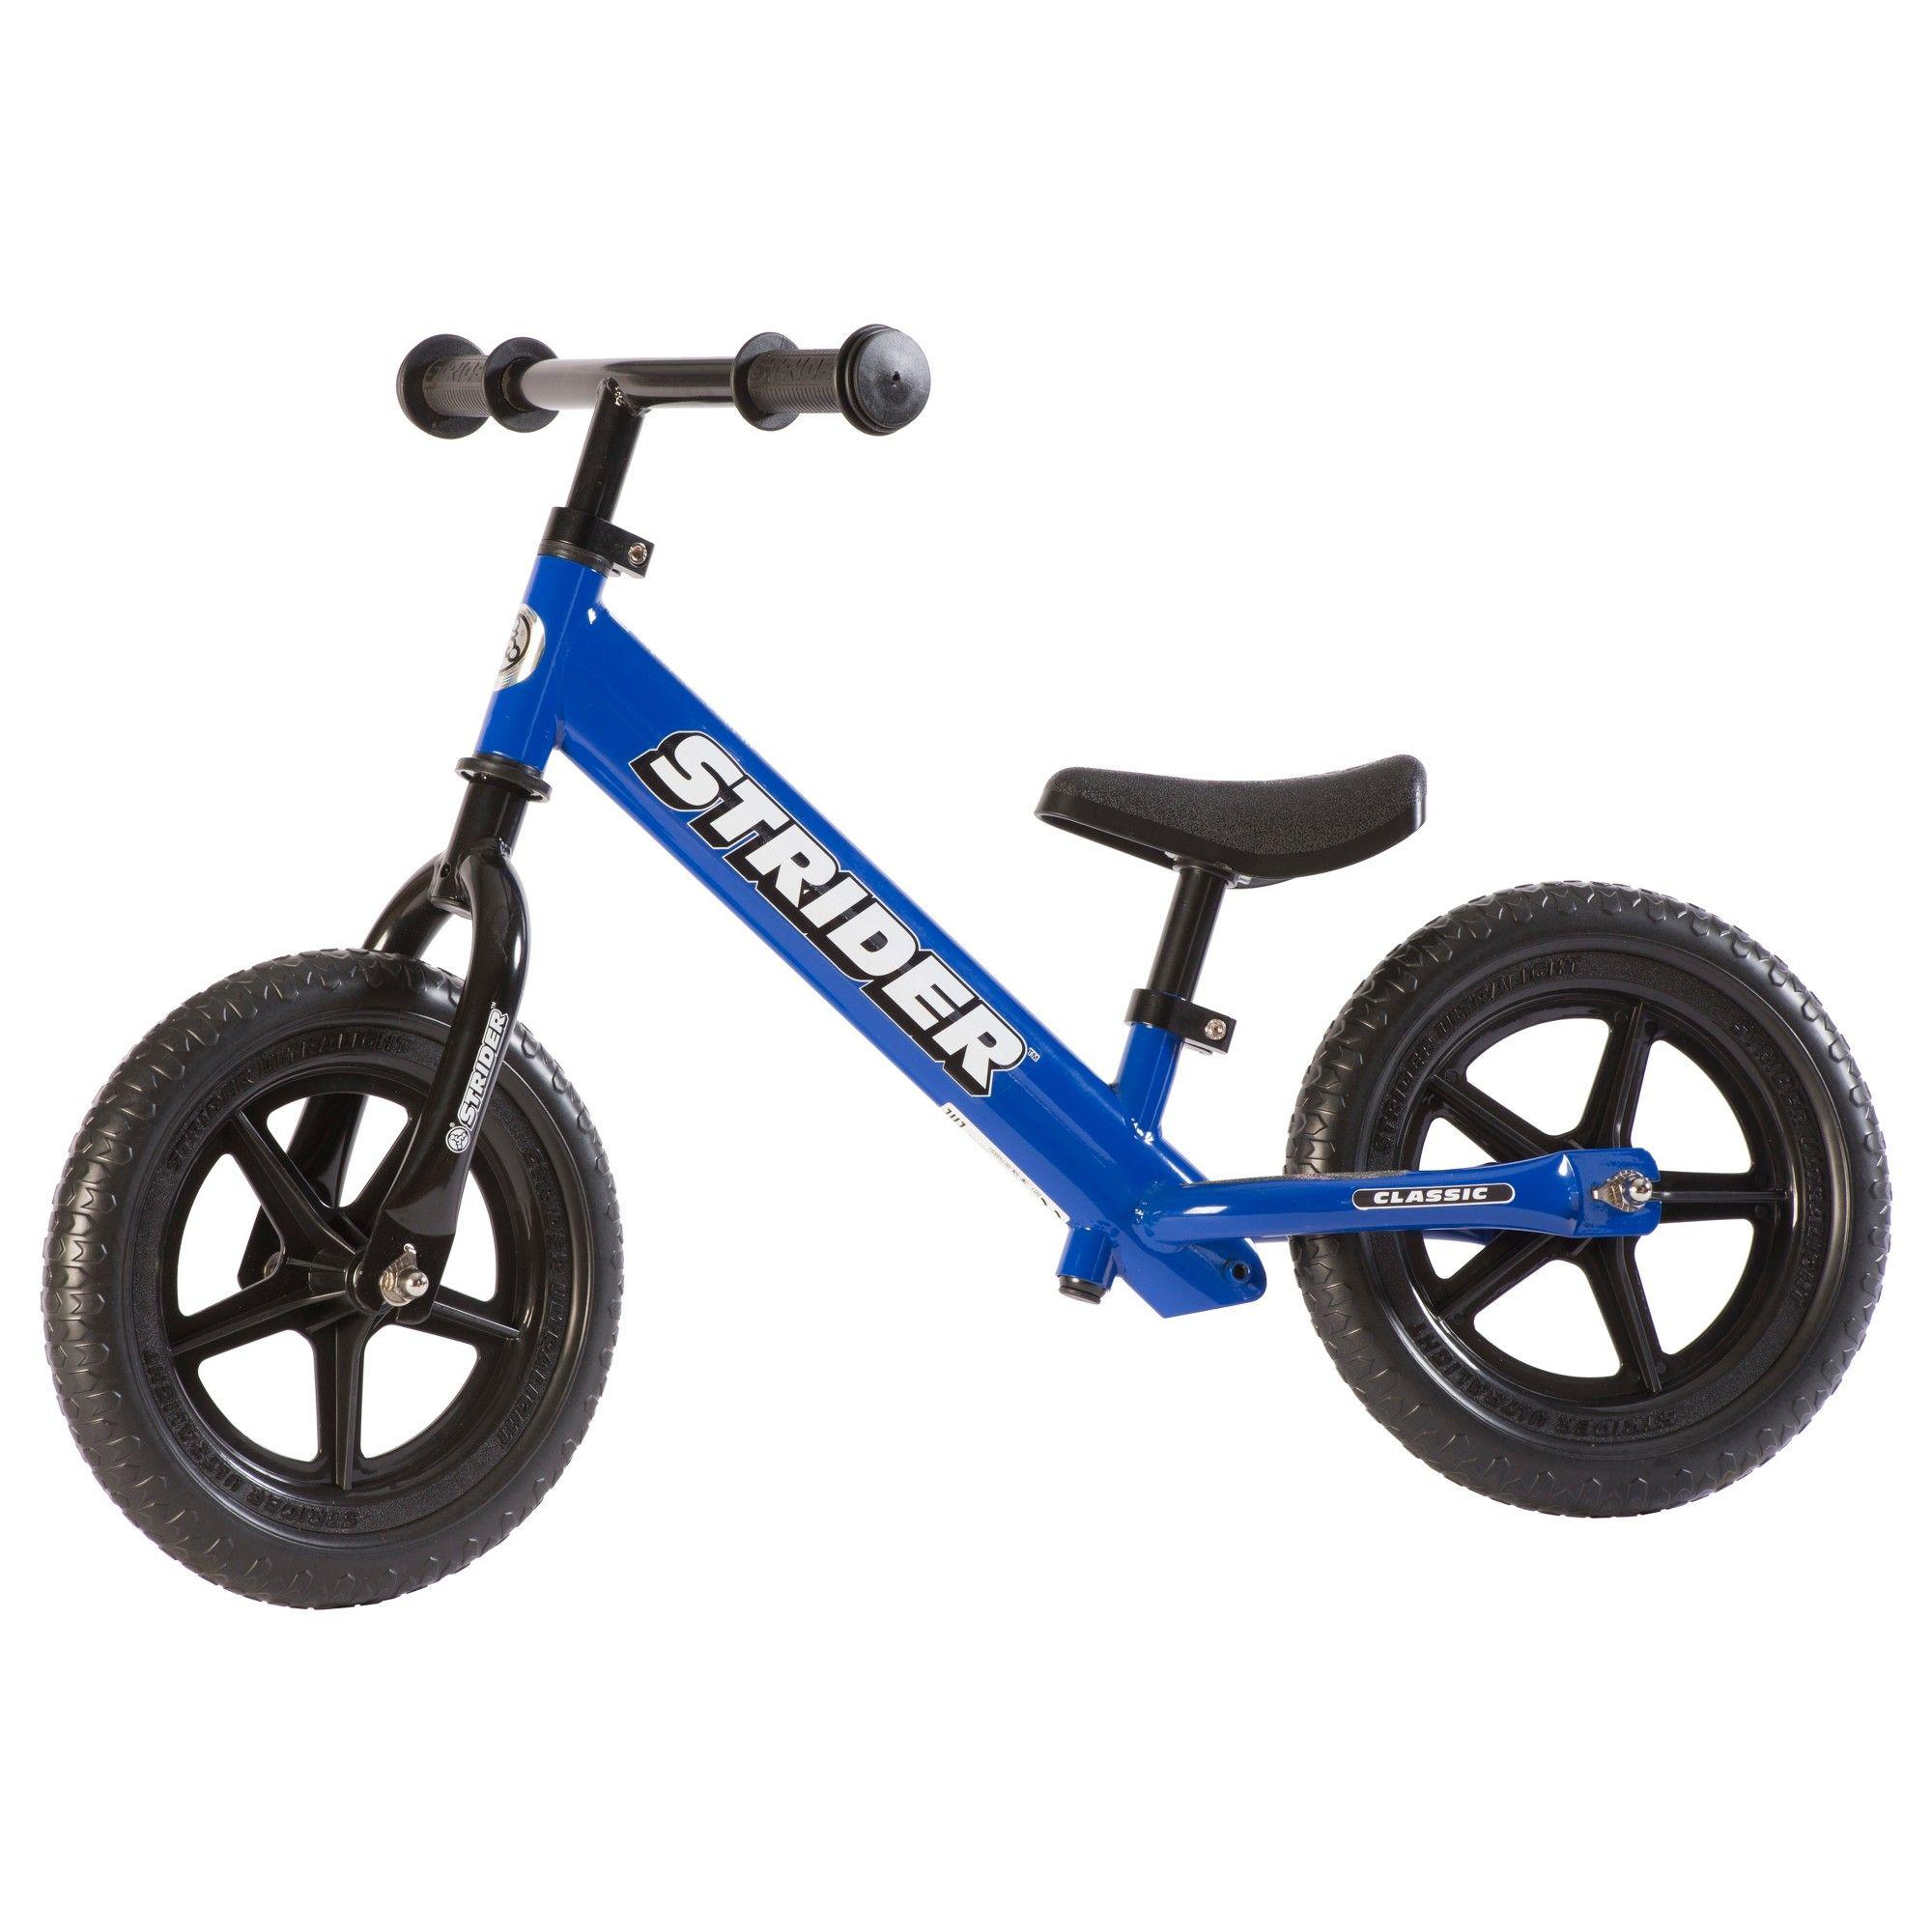 STRIDER 12' Classic Kids' Balance Bike Blue in 2020